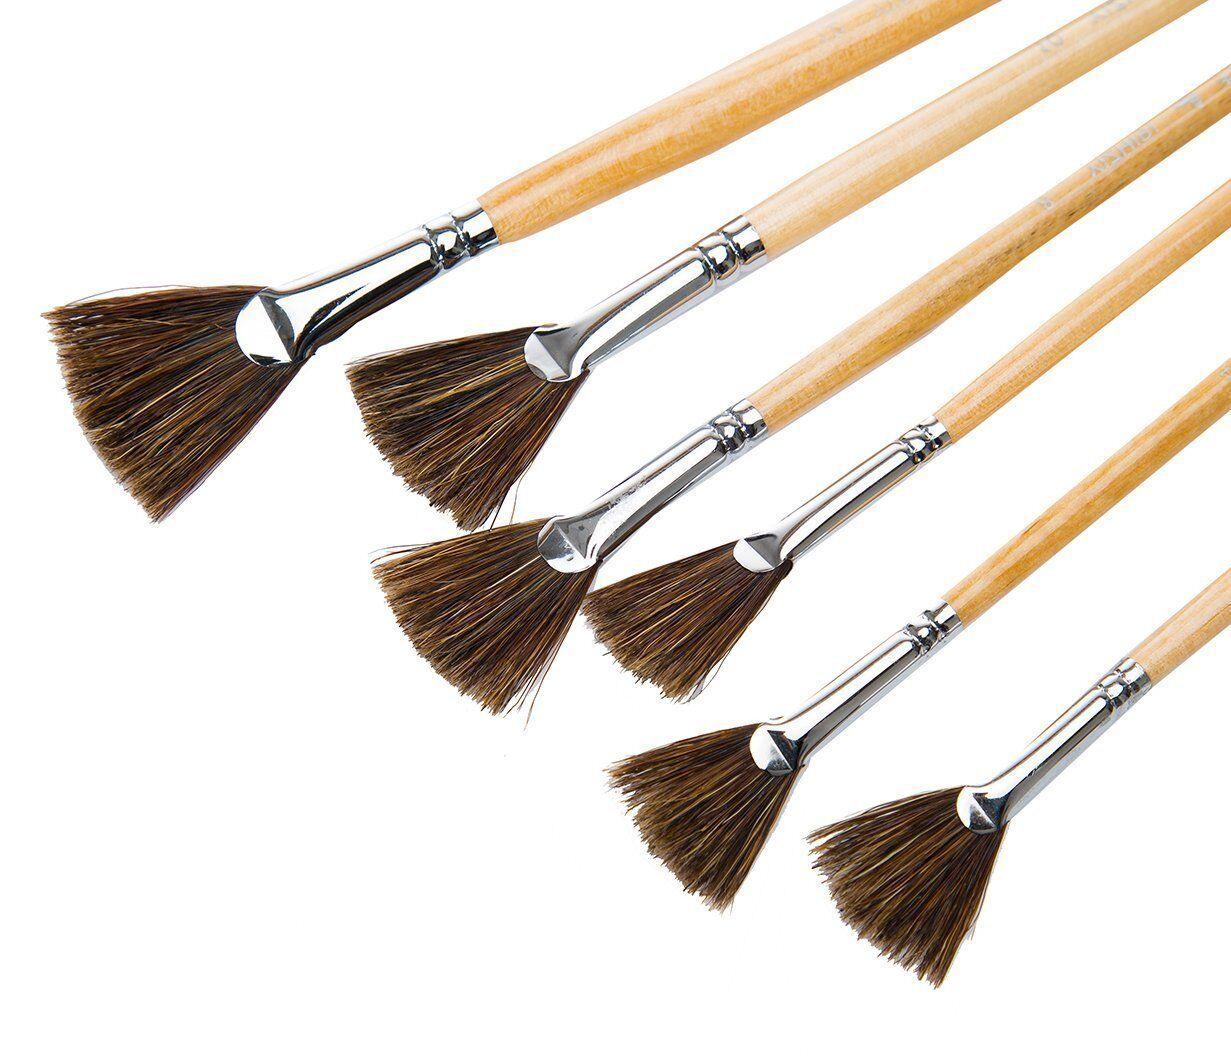 6 Pieces MEEDEN Artist Fan Paint Brush Set Long Handle for Oil Acrylic Painting Handmade Hog Bristle